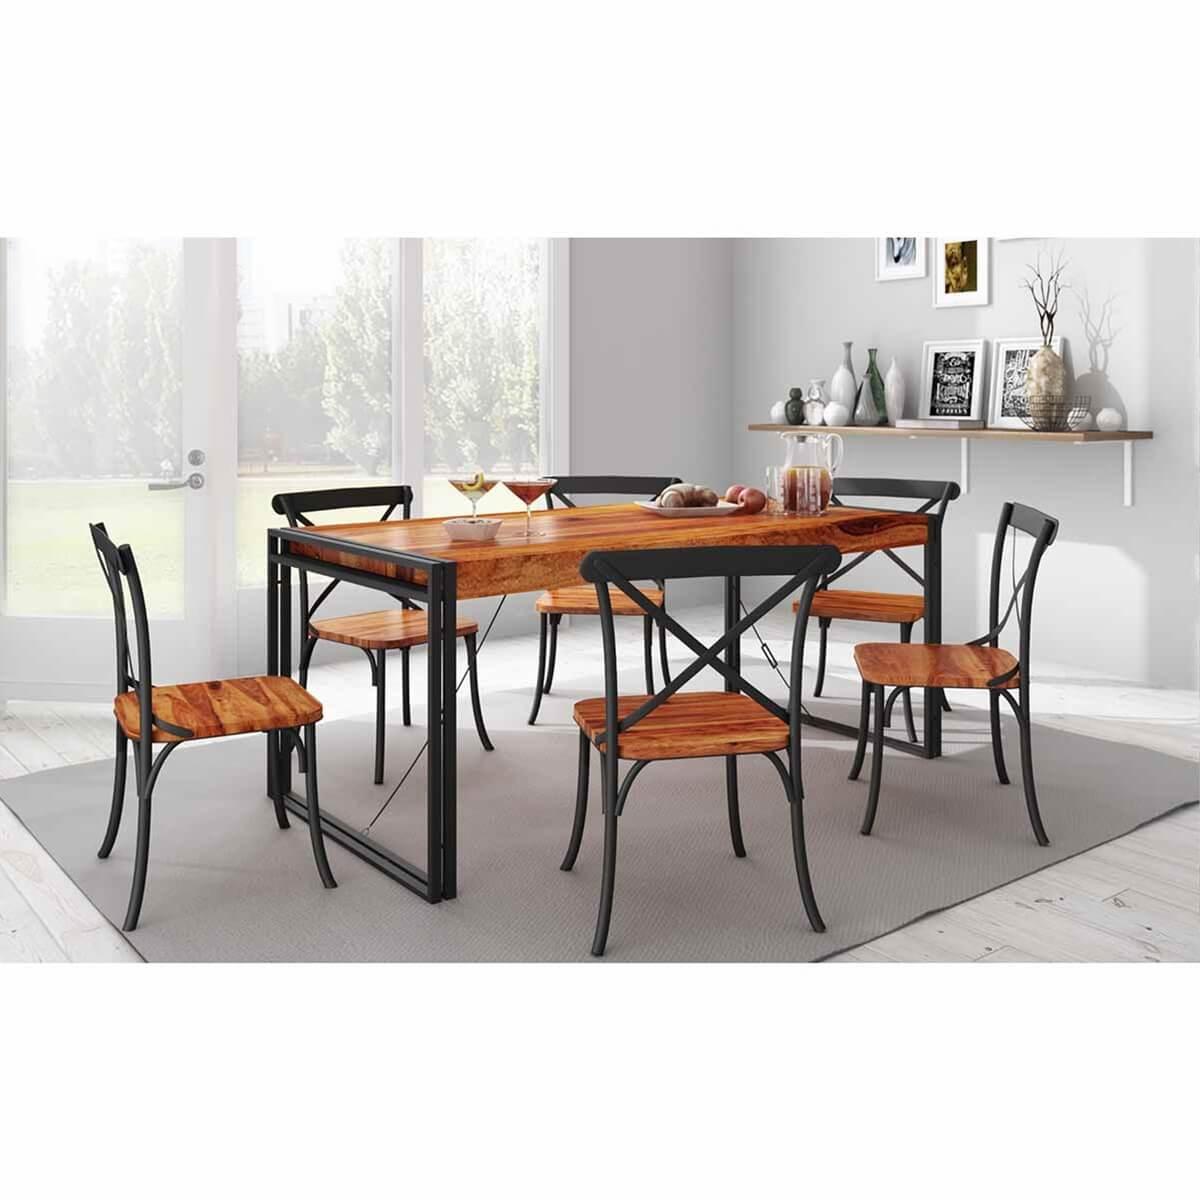 Texas industrial handmade rustic solid wood dining table chair set - Handmade wooden dining tables ...